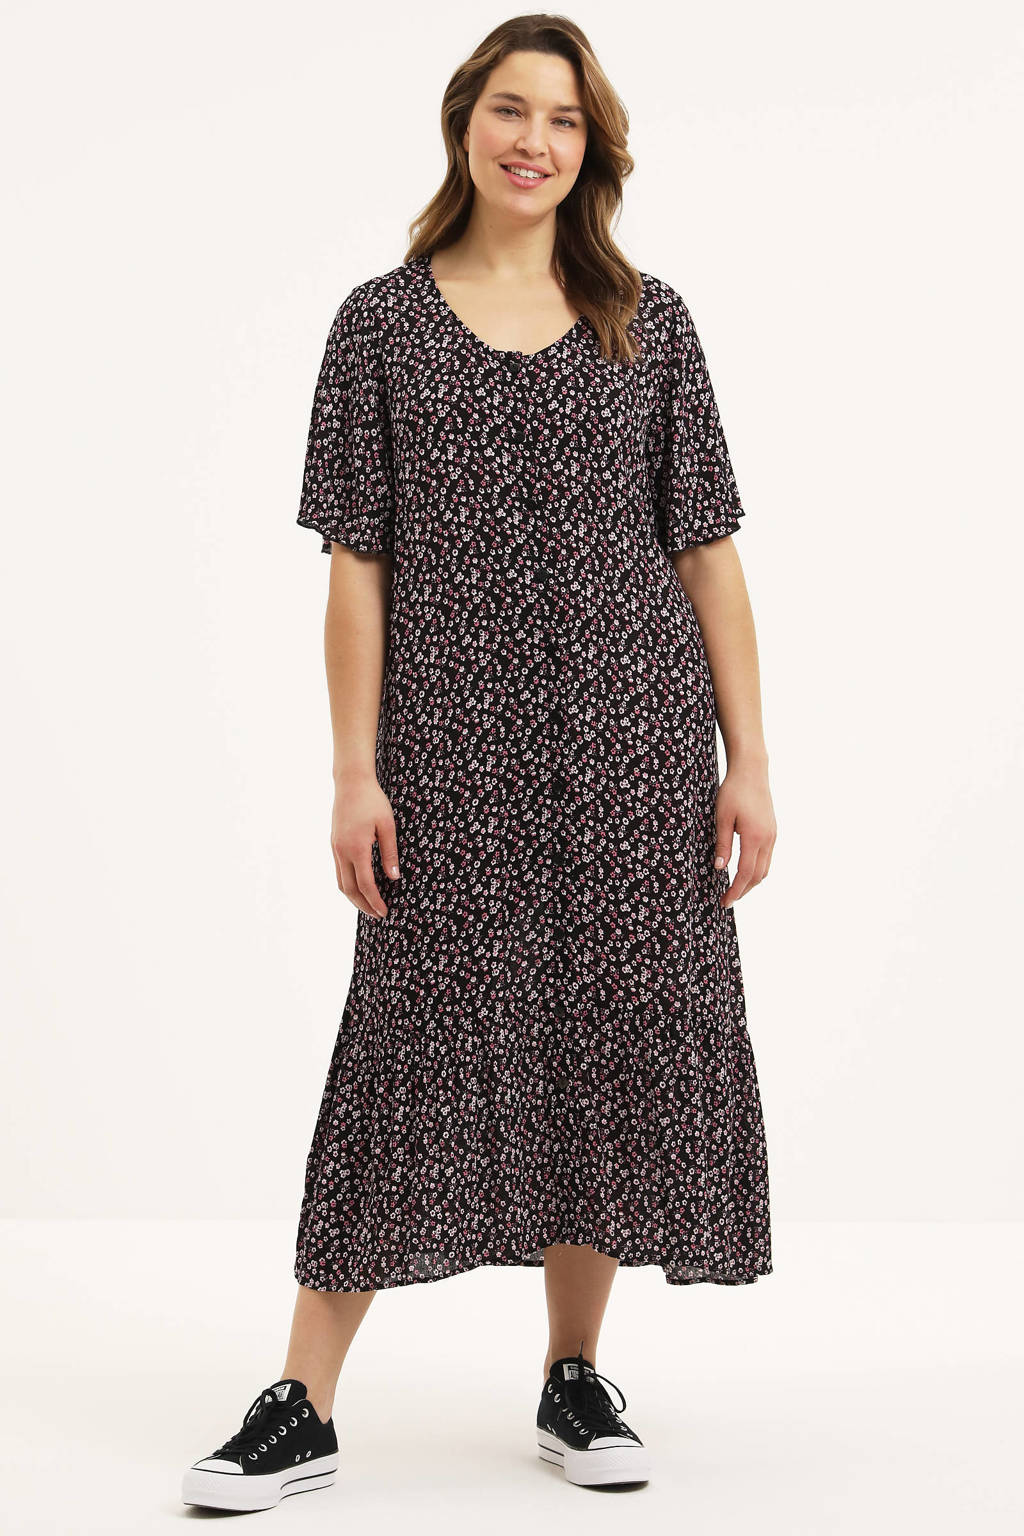 STUDIO gebloemde semi-transparante A-lijn jurk Ida zwart/wit/roze, Zwart/wit/roze